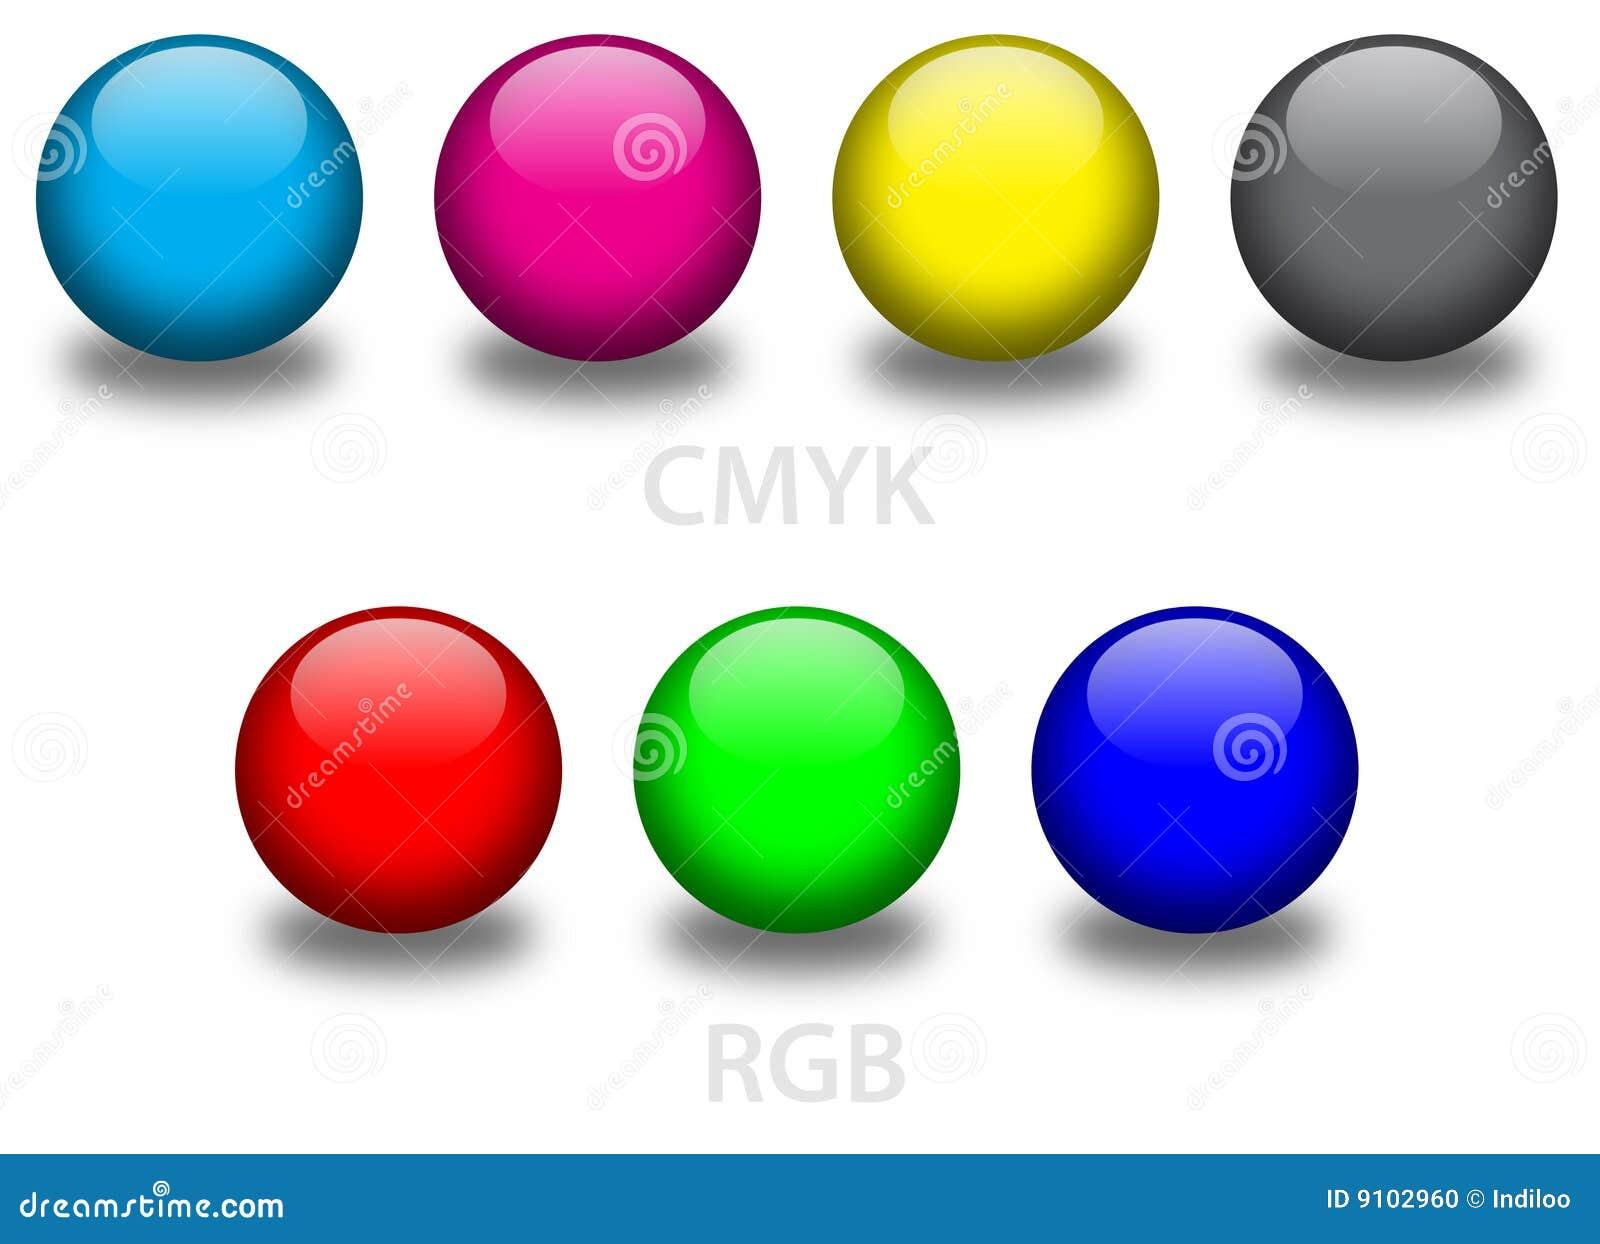 CMYK and RGB glass balls